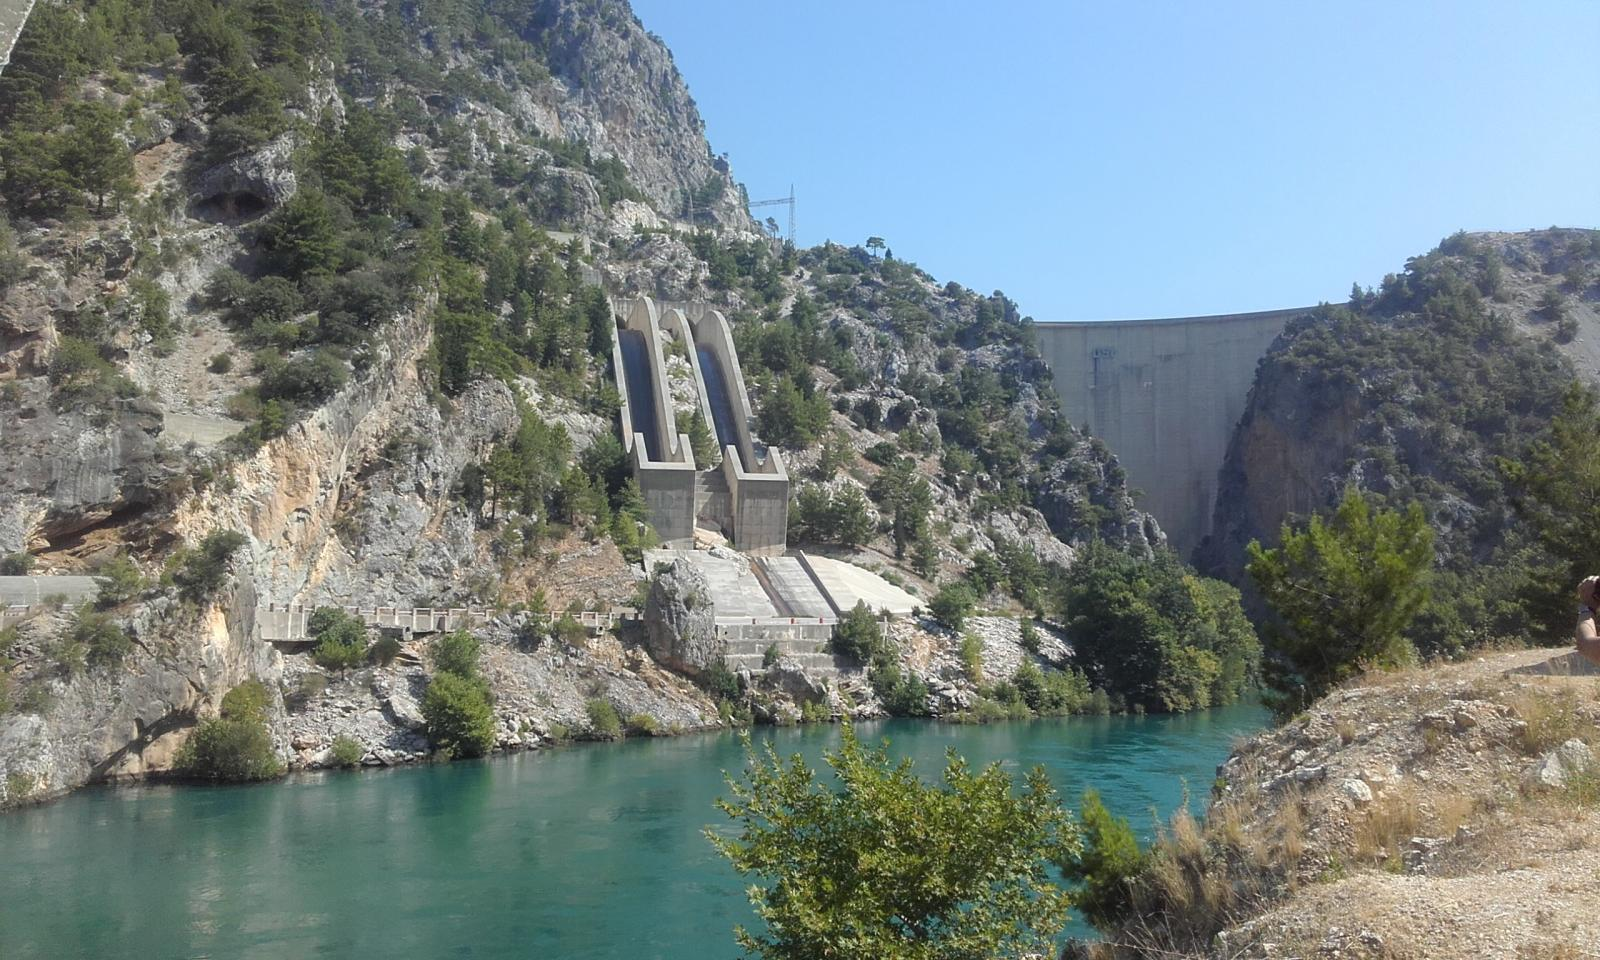 Чудо турецкой гидротехнической мысли плотина Оймапинар